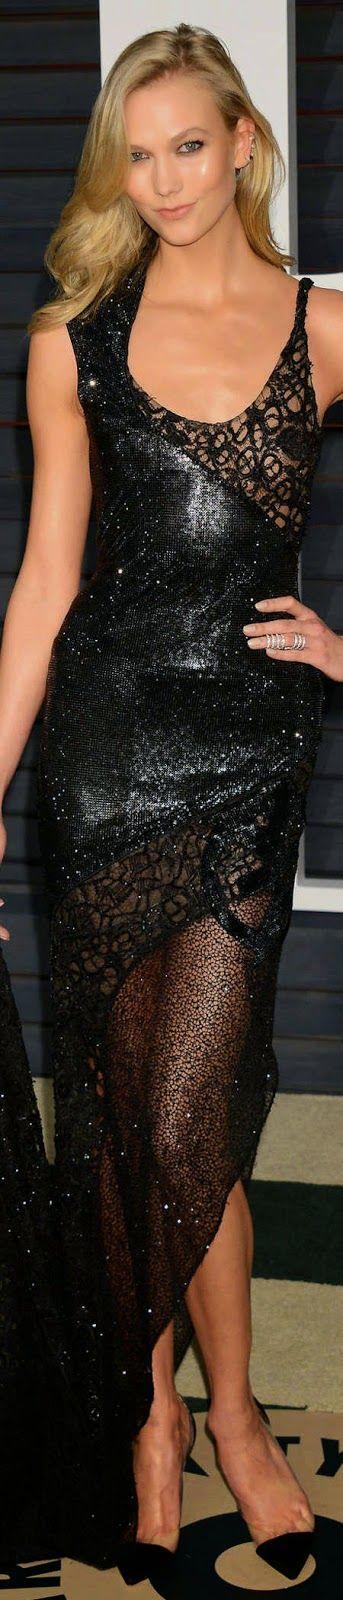 Karlie Kloss 2015 Vanity Fair Oscar Party / Karlie Kloss in Atelier Versace